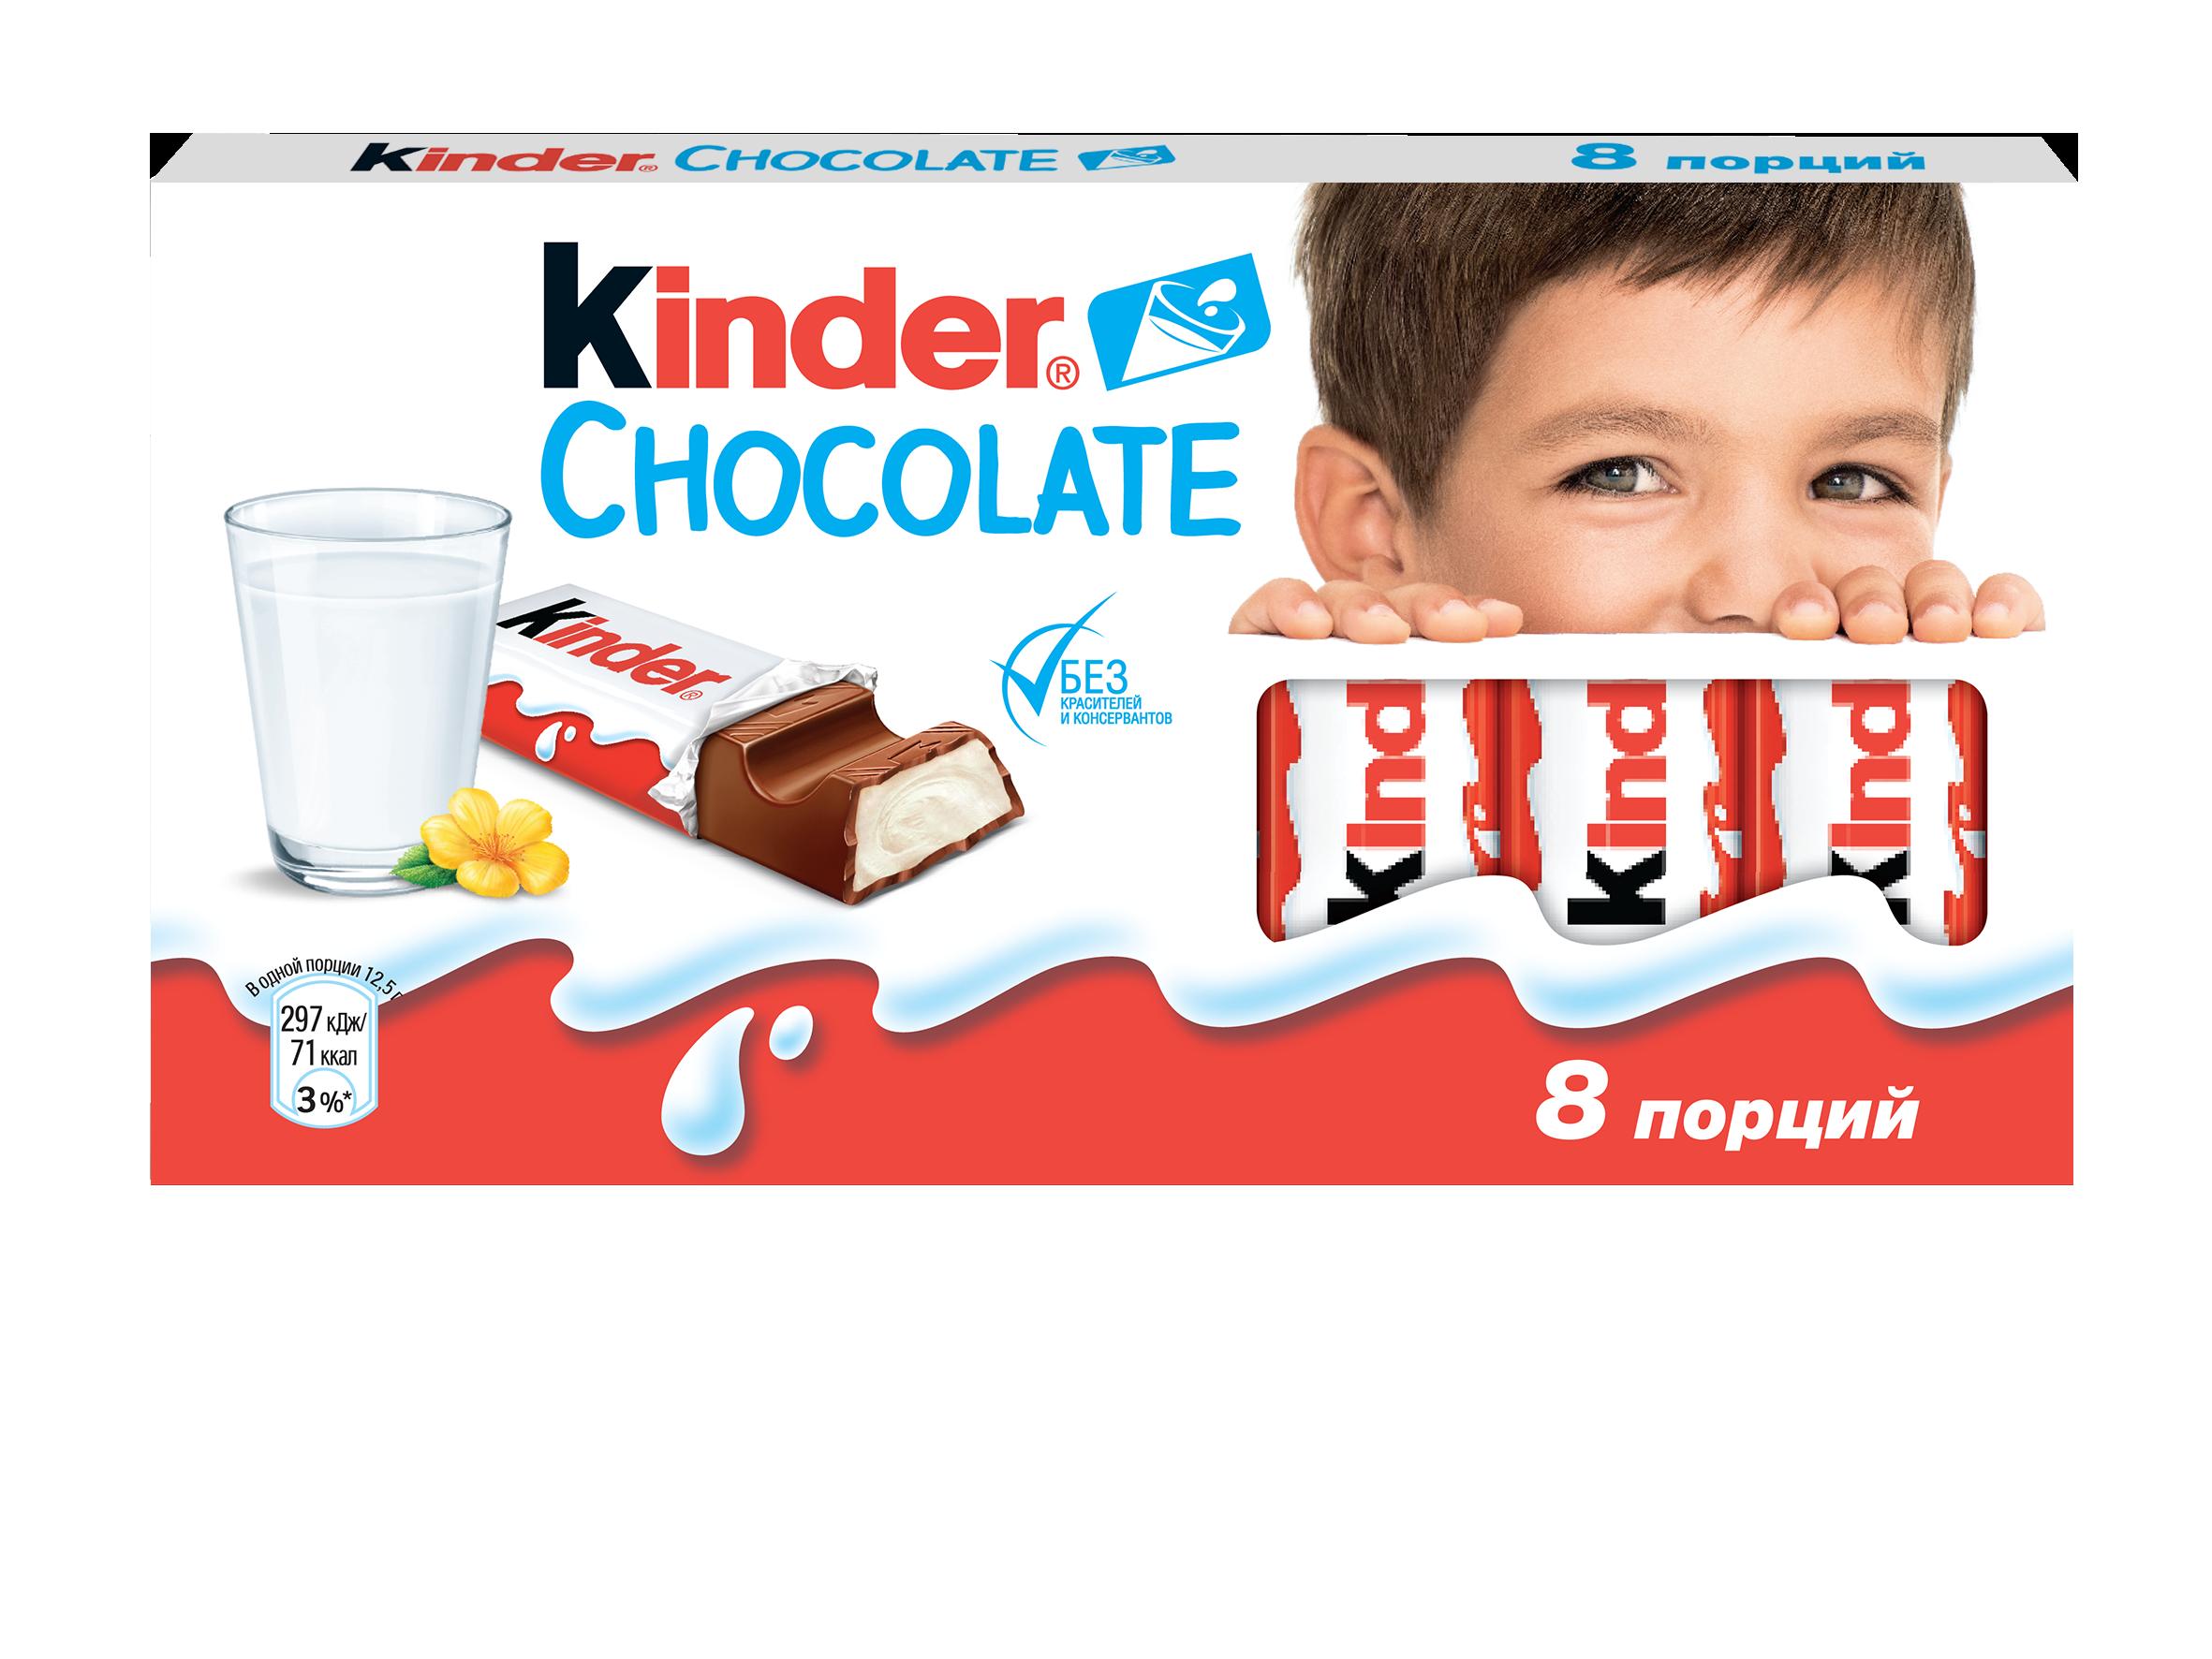 Kinder®  Chocolate меняет упаковку